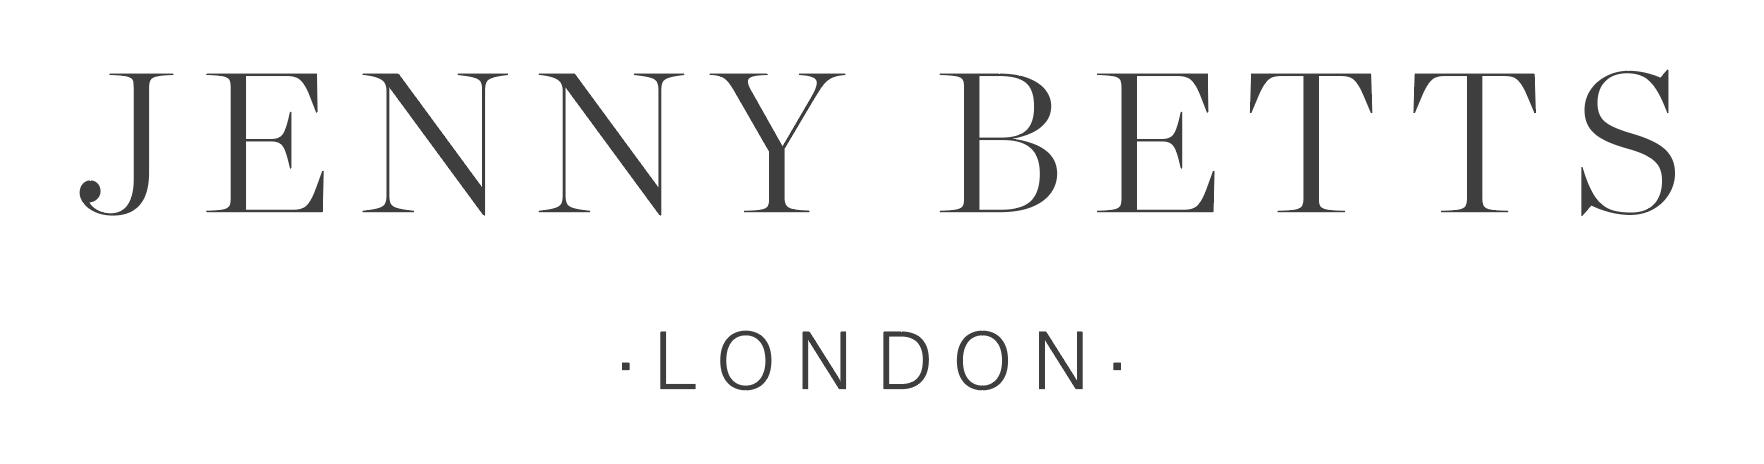 Jenny Betts London branding